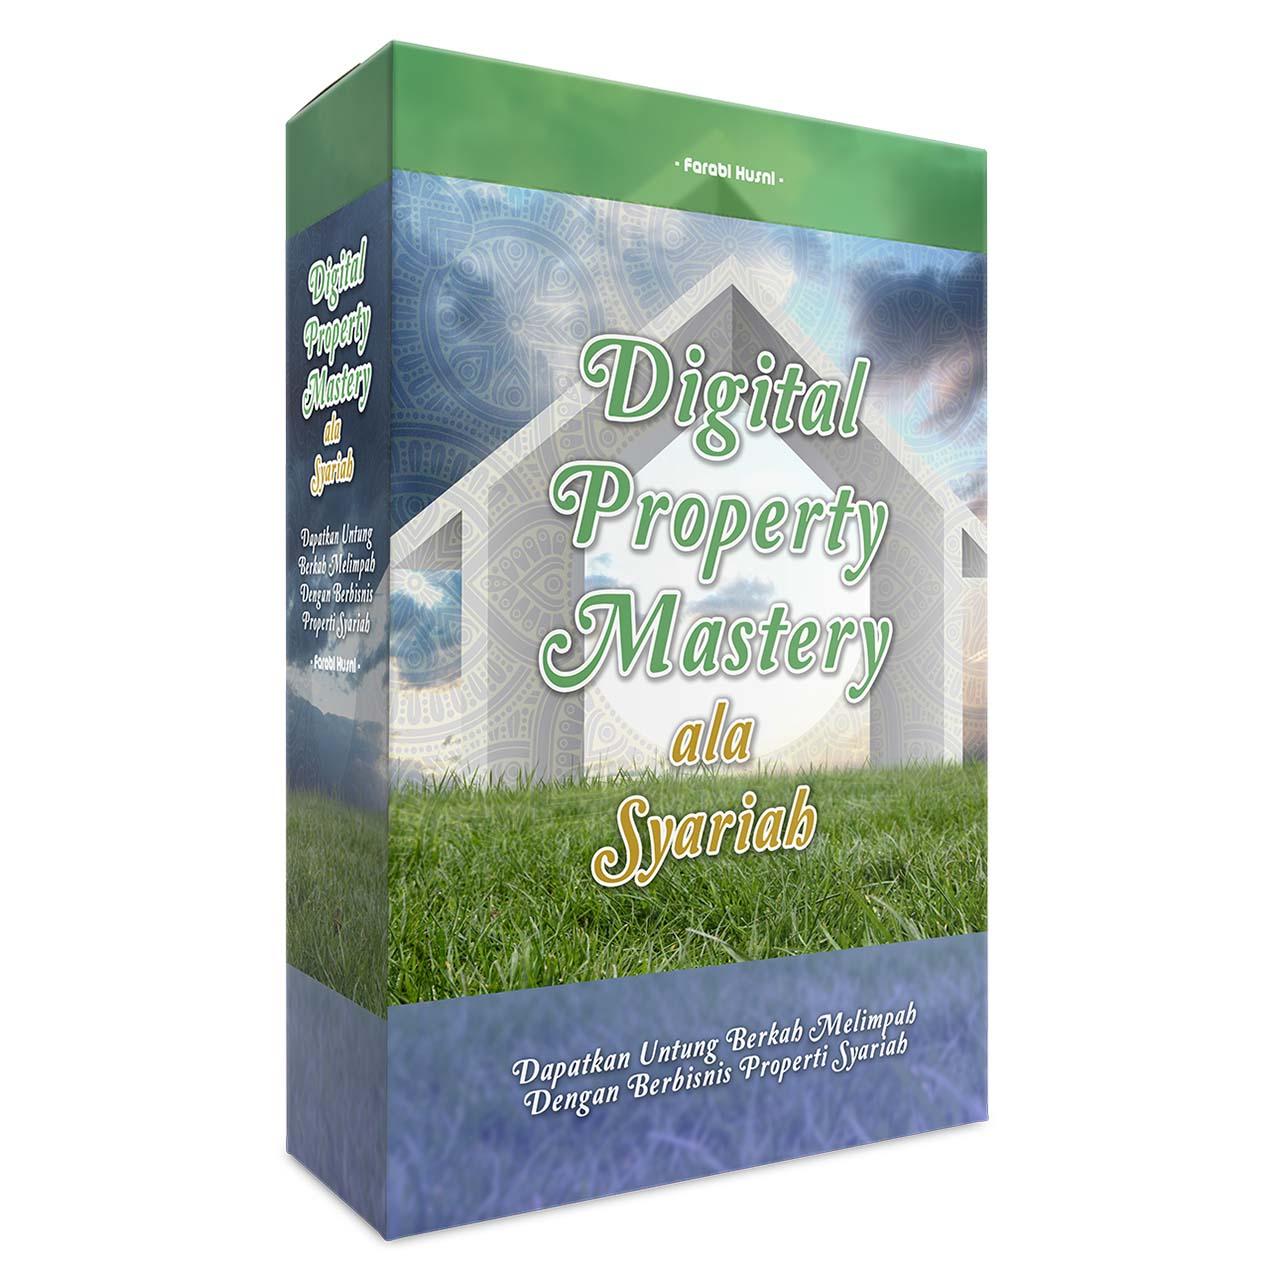 Digital Property Mastery